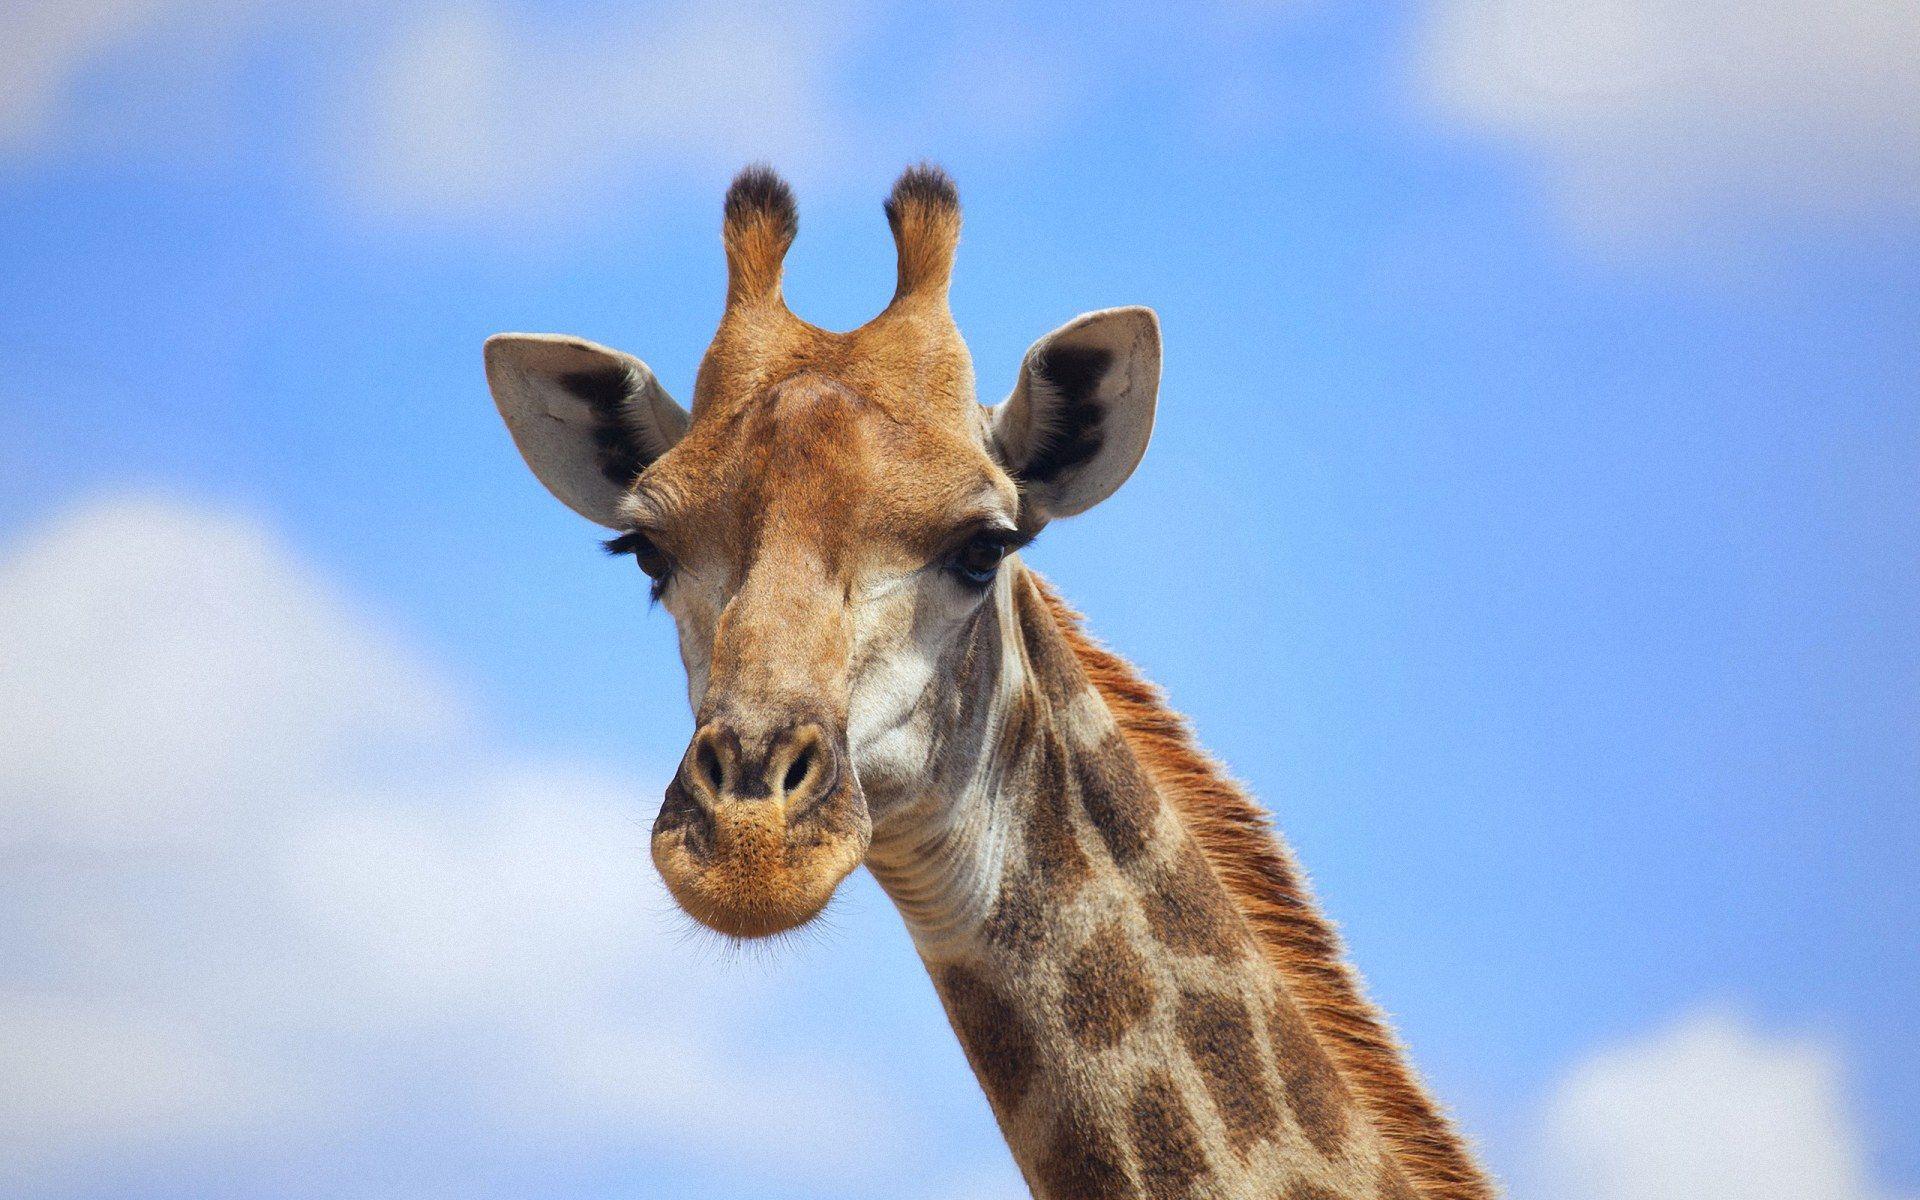 Baby Giraffe Wallpaper Wallpaper Giraffe Images Funny Giraffe Pictures Giraffe